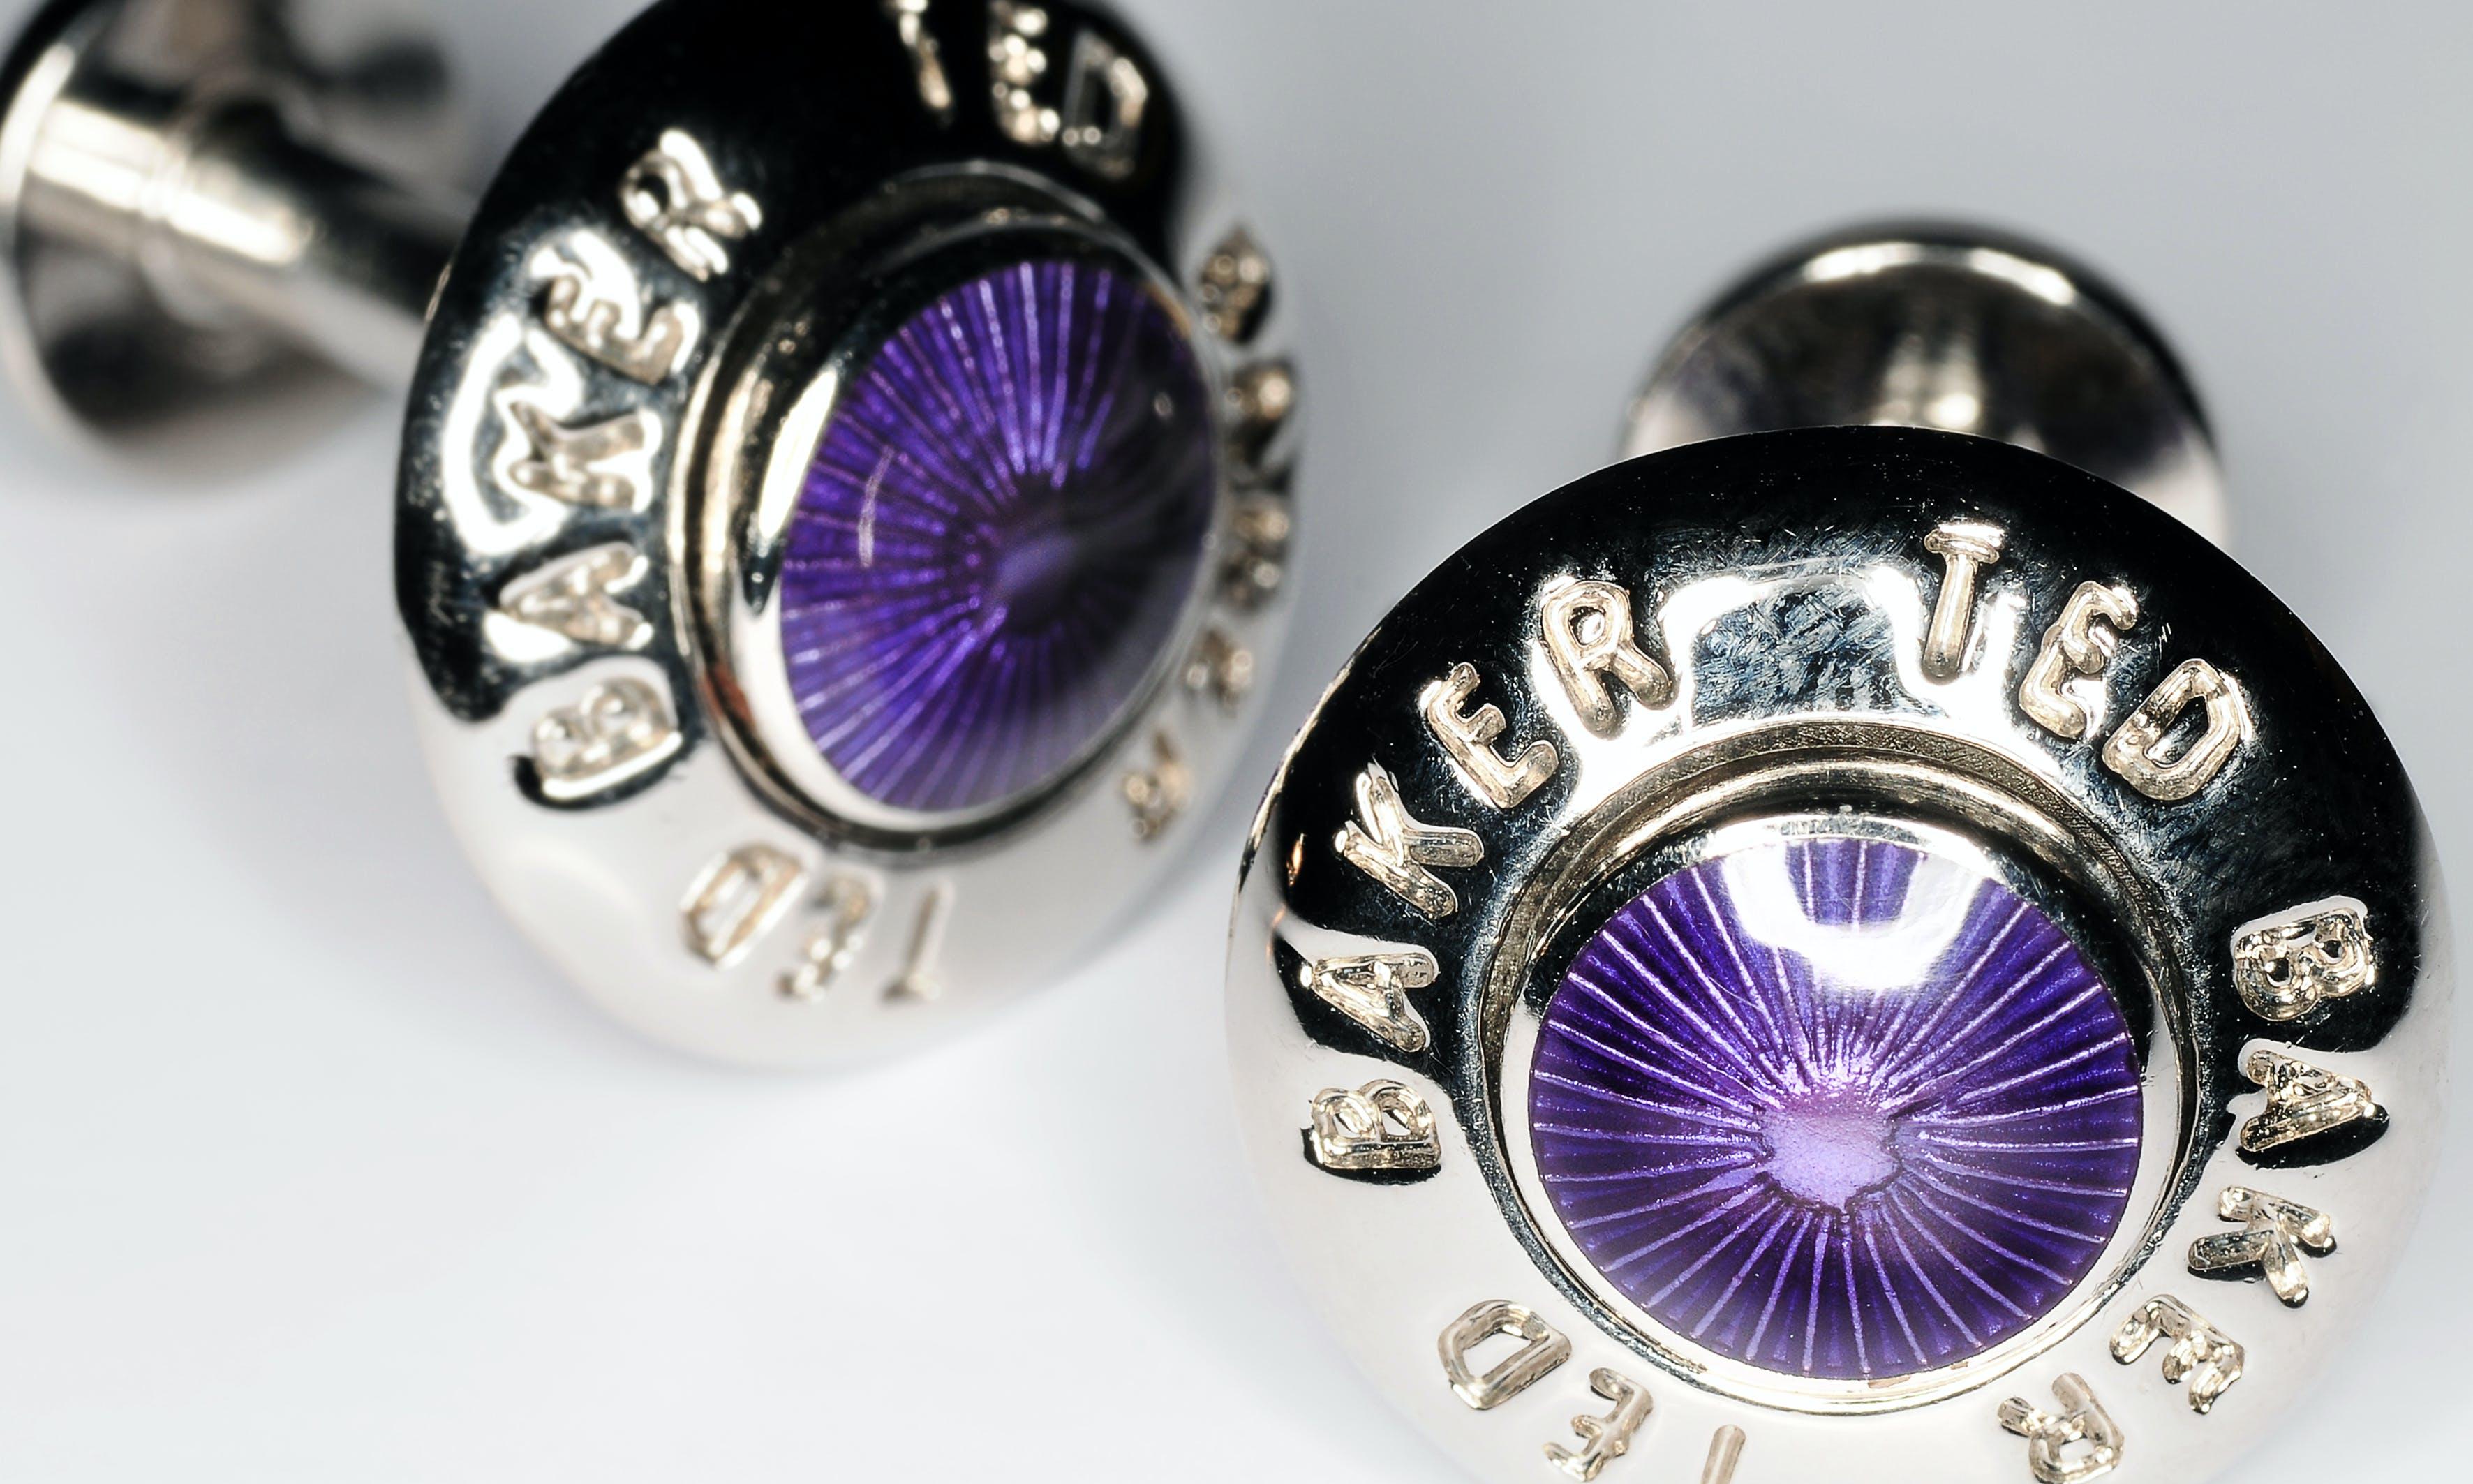 Free stock photo of Purple & Silver cufflinks